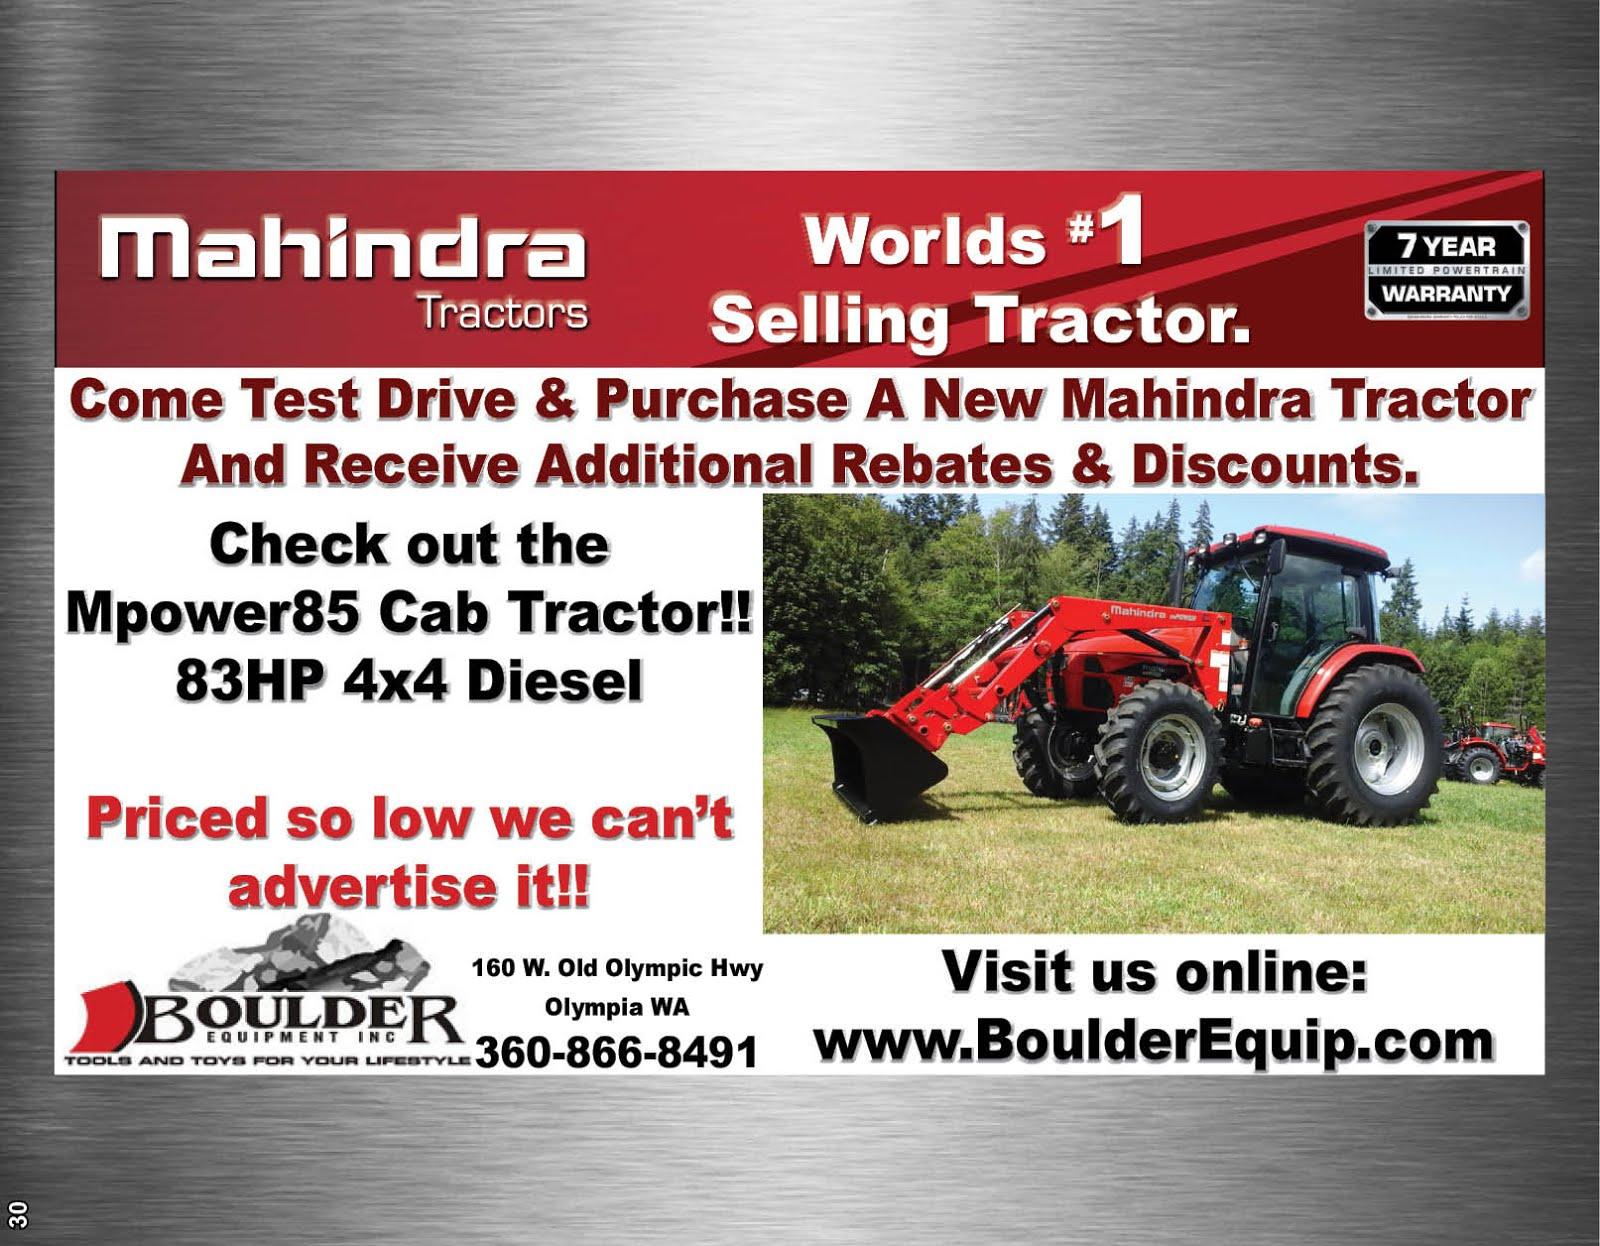 Boulder Equipment Mahindra Tractor Special!!